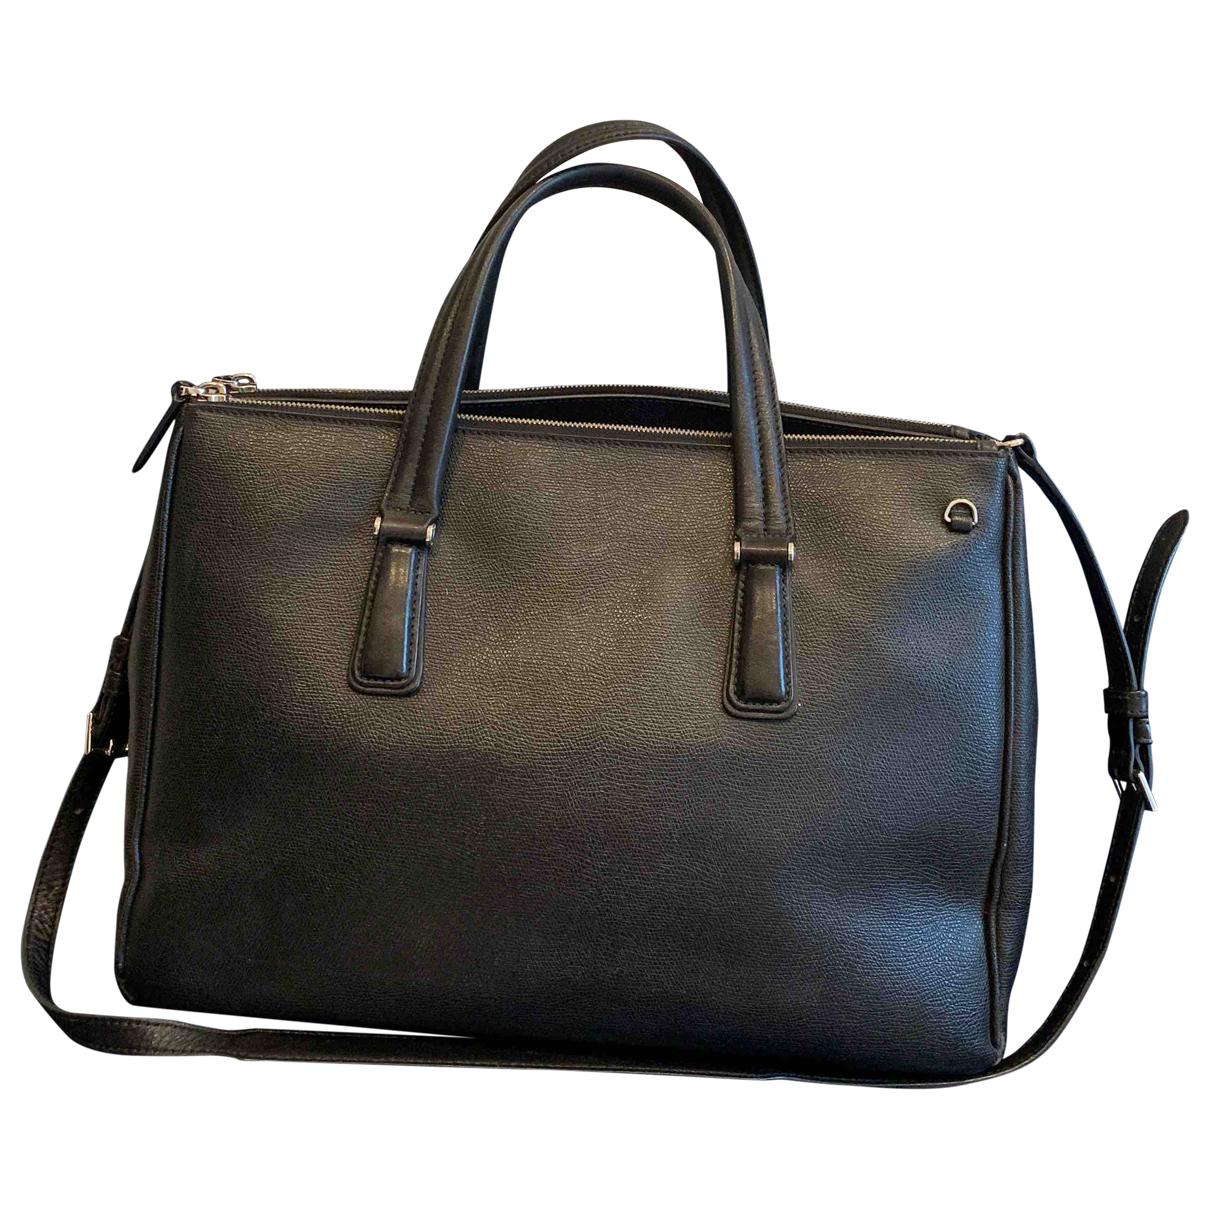 Tumi N Black Leather handbag for Women N